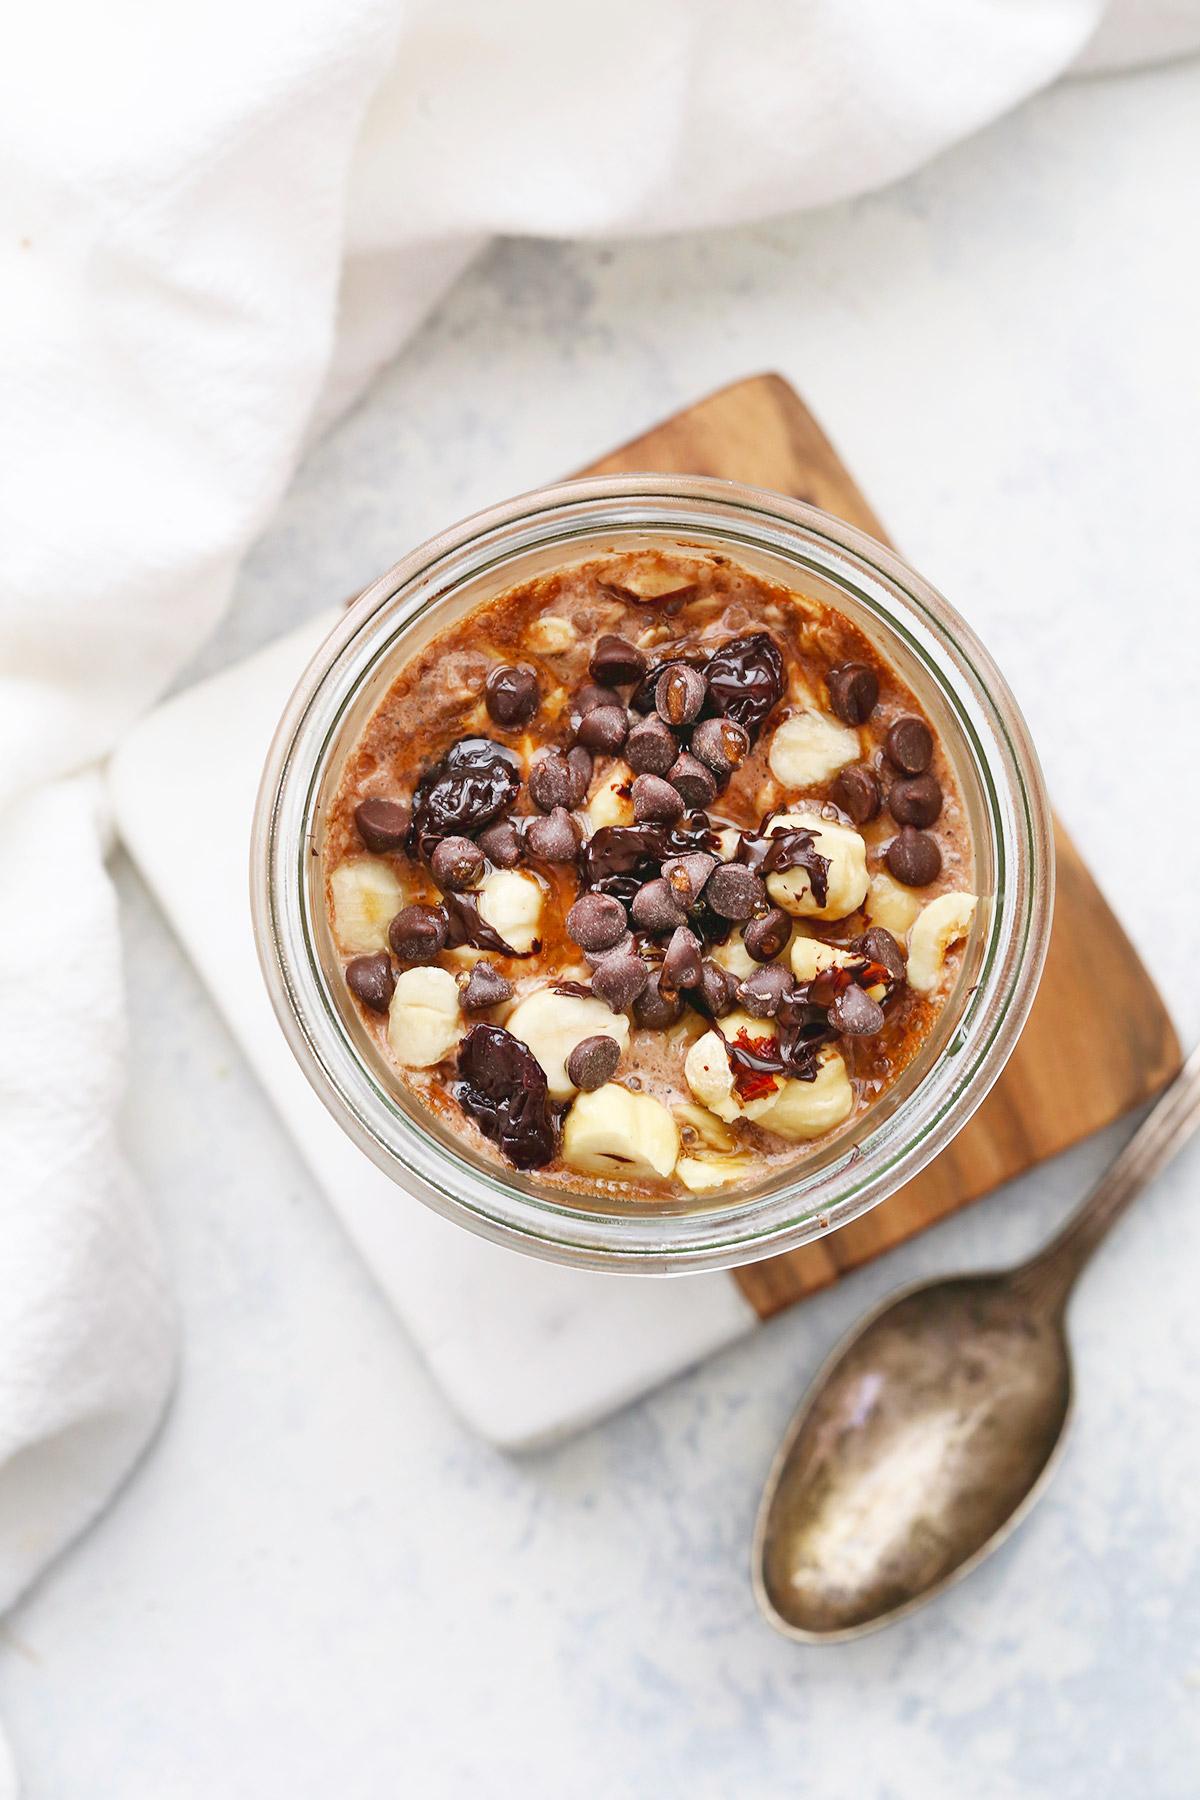 Chocolate Hazelnut Overnight Oats from One Lovely Life